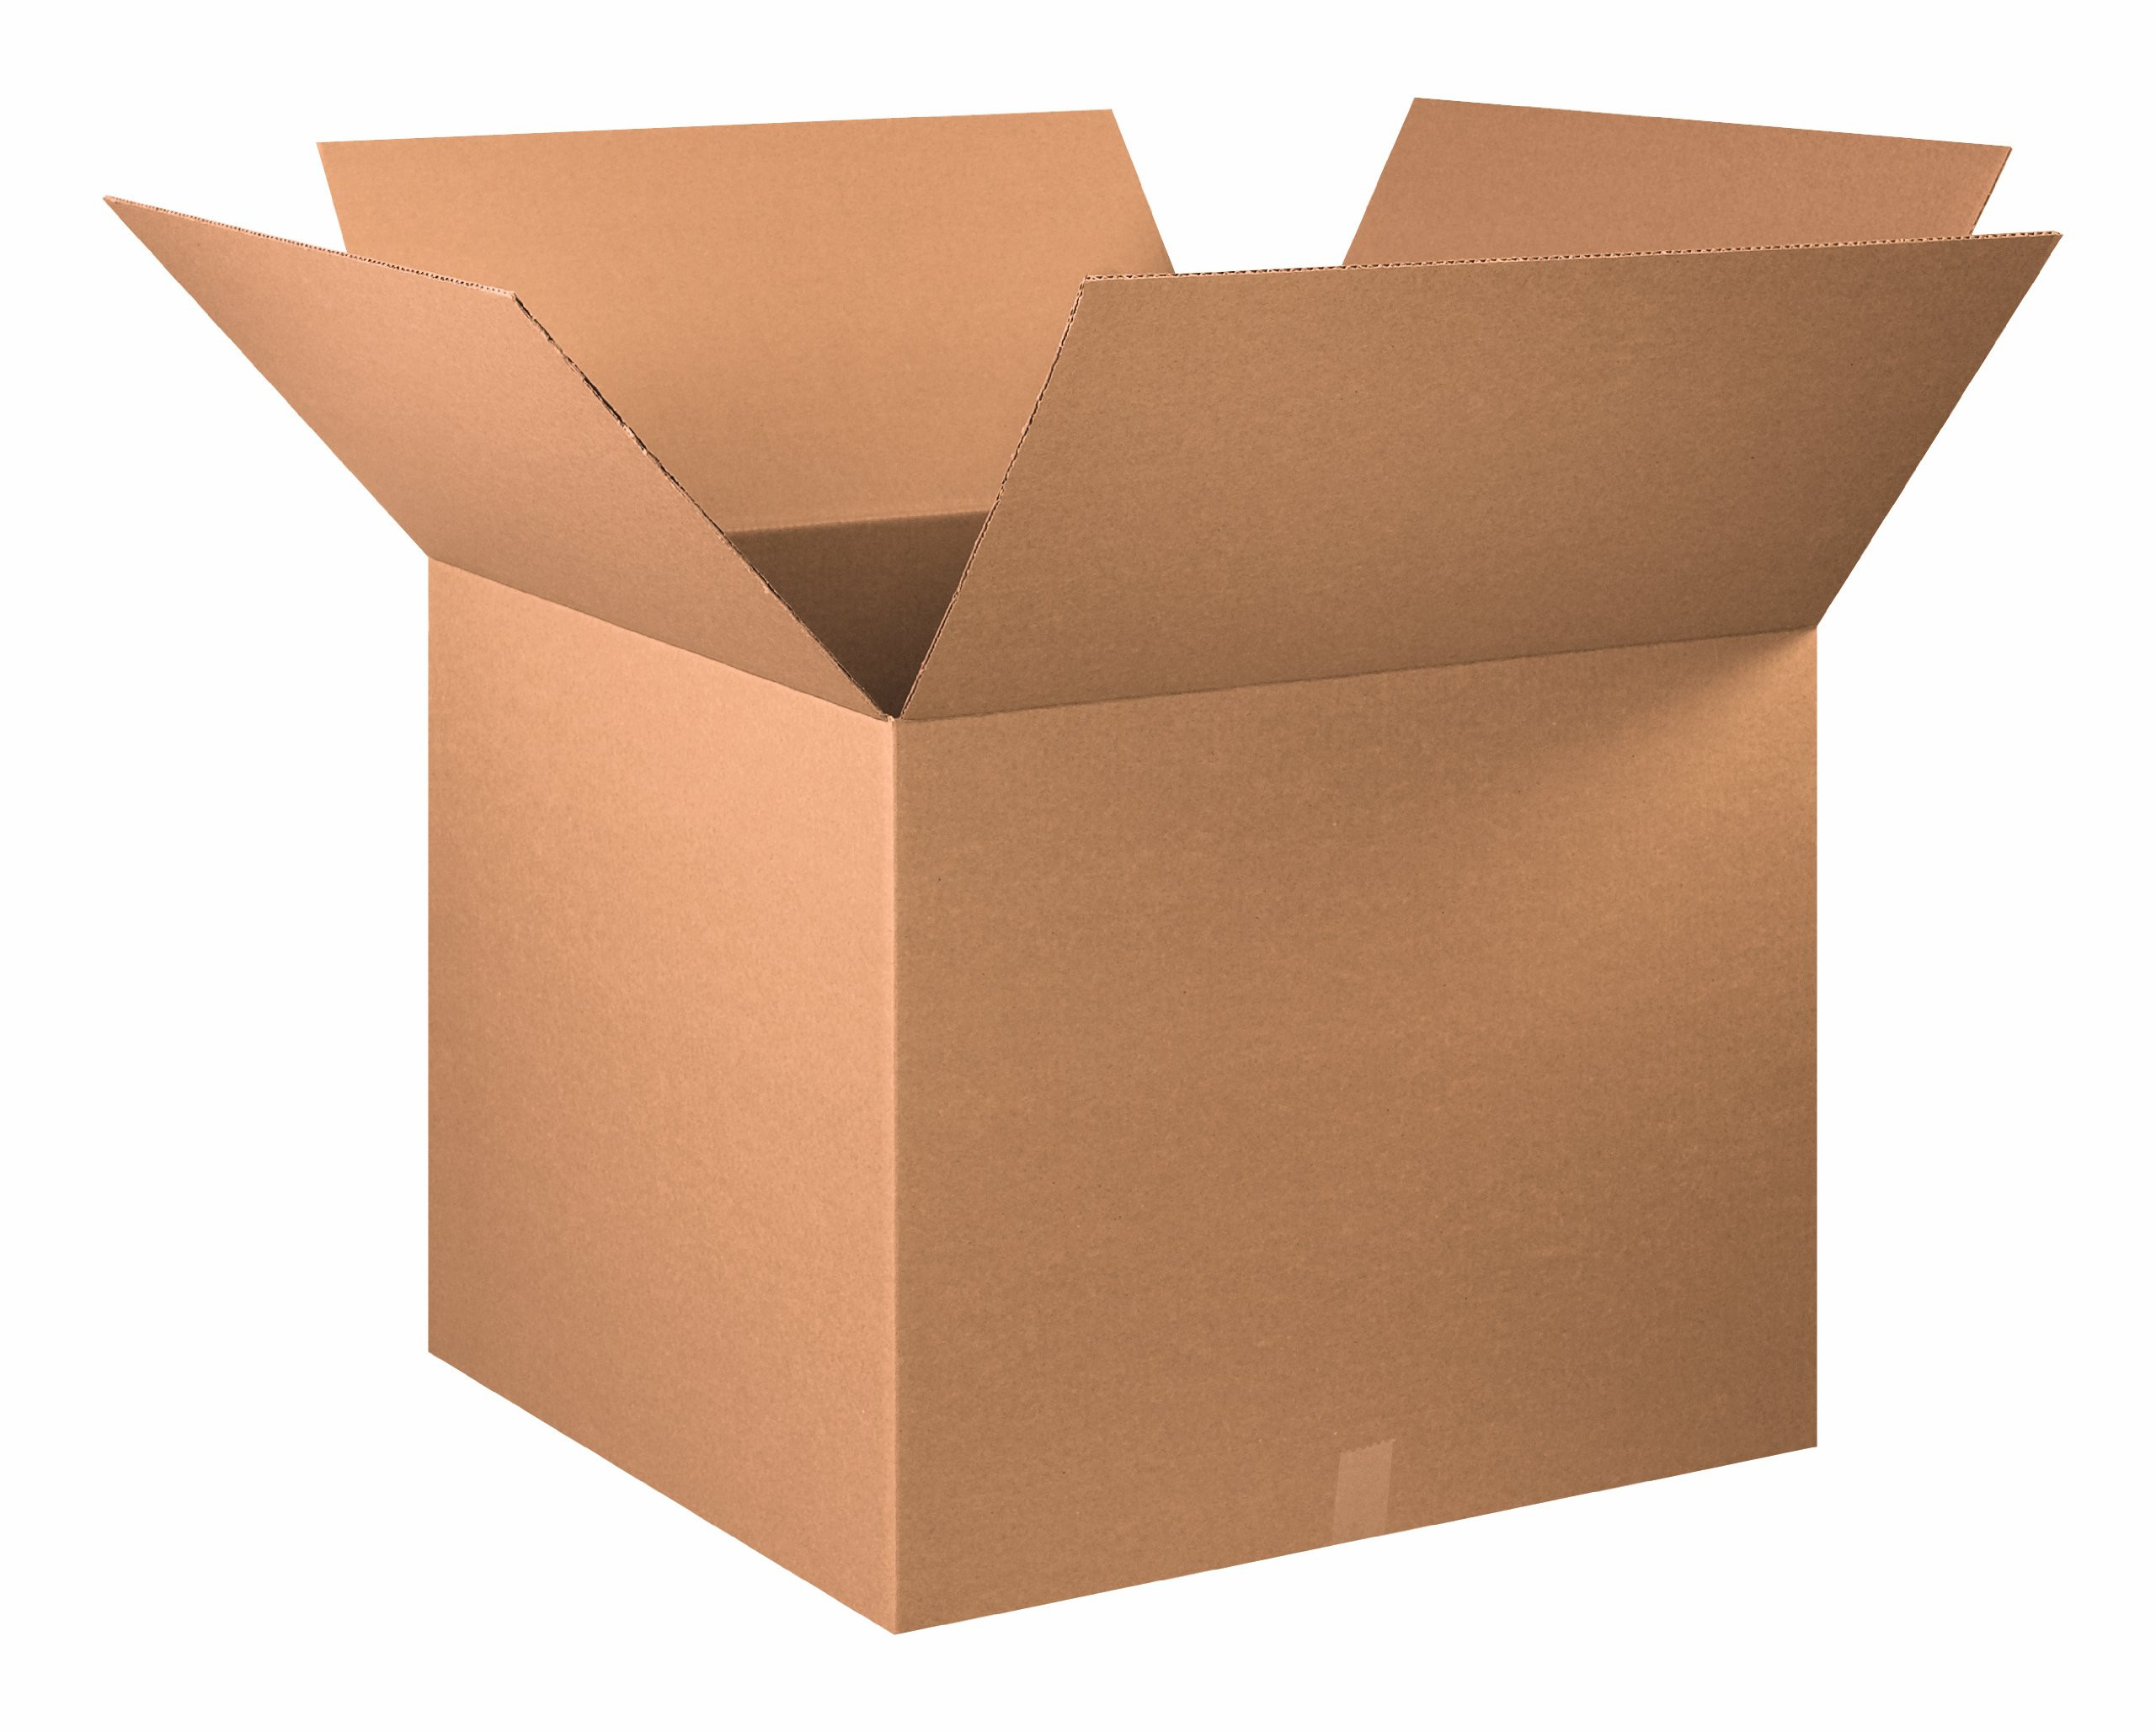 Aviditi 303025 Corrugated Box, 30'' Length x 30'' Width x 25'' Height, Kraft (Bundle of 5)